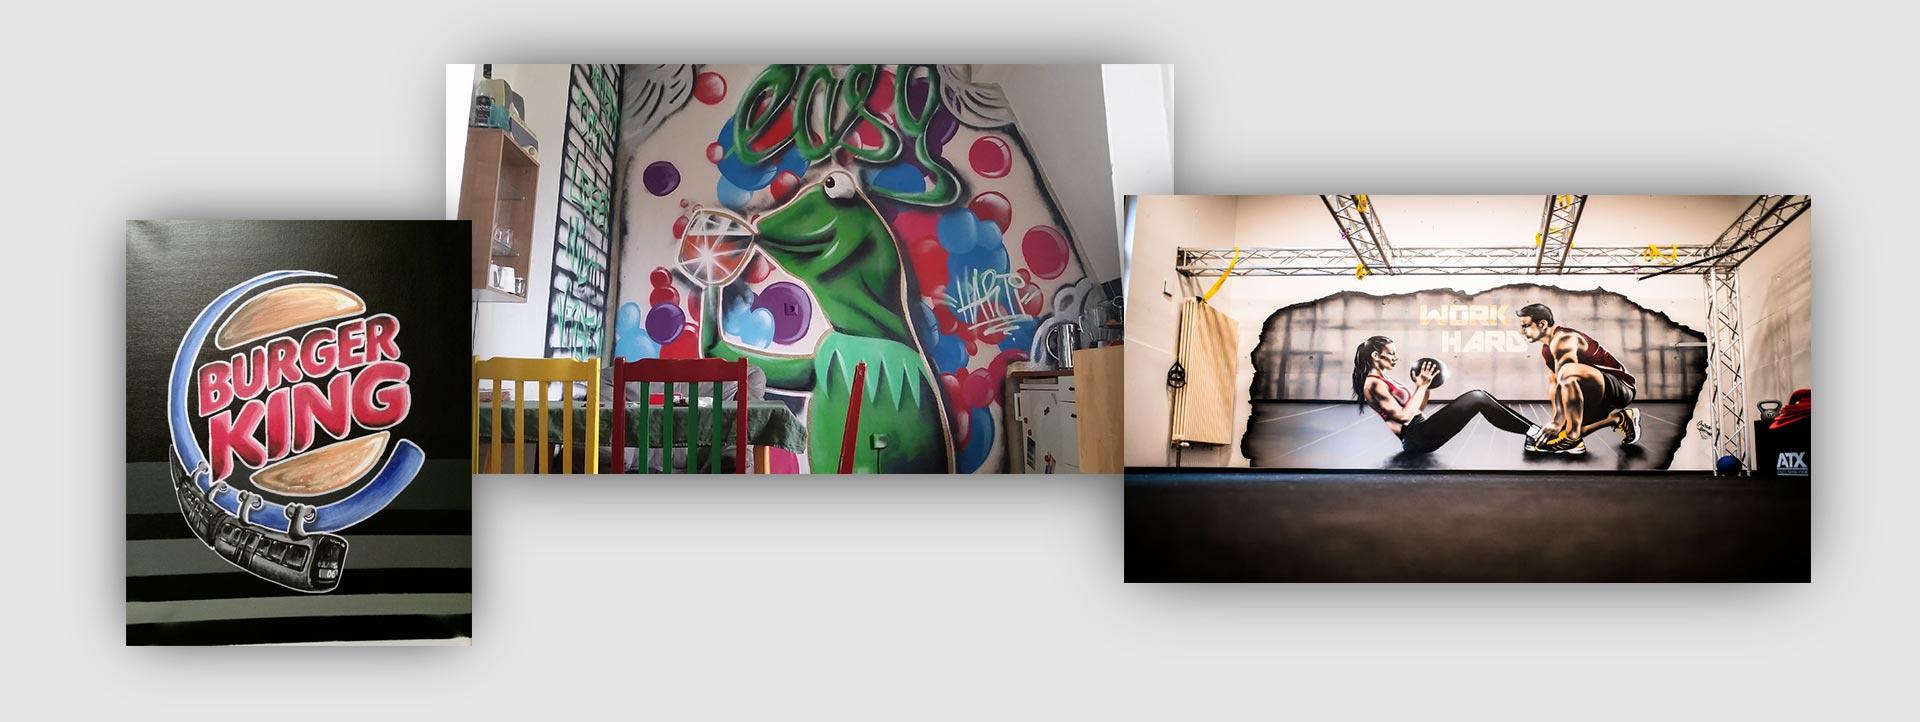 graffitiartist-preise-honorare-stufen